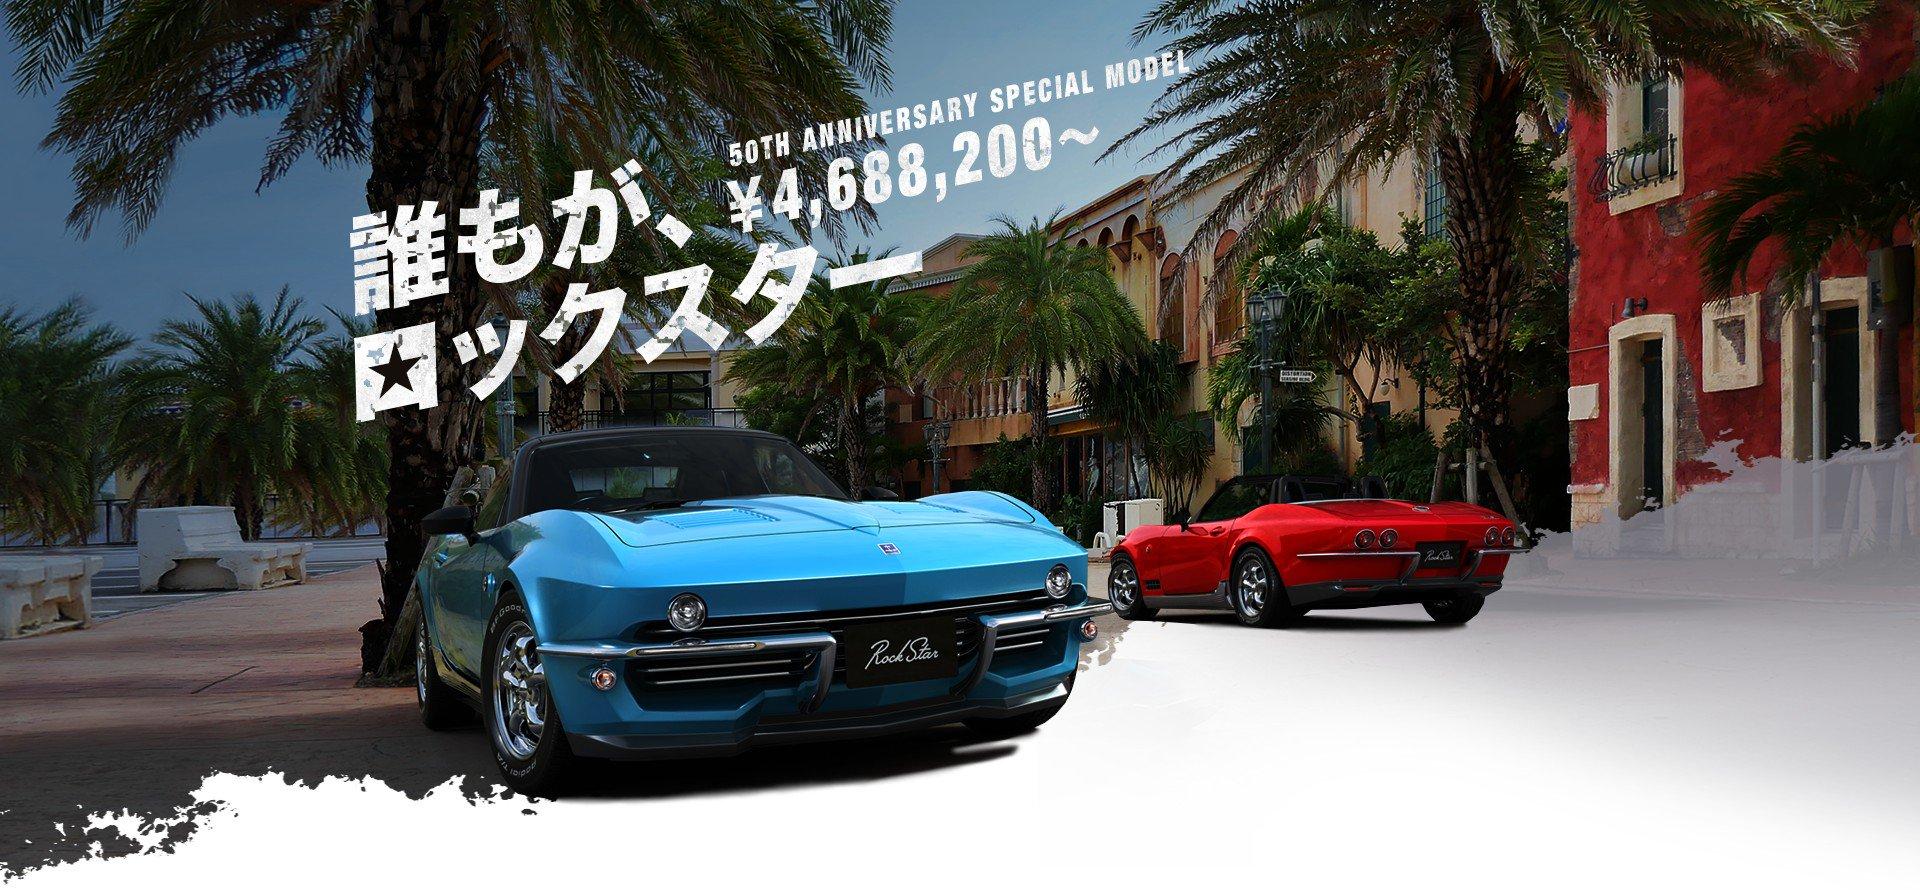 mitsuoka-rock-star-is-half-mazda-mx-5-miata-half-chevrolet-corvette_6